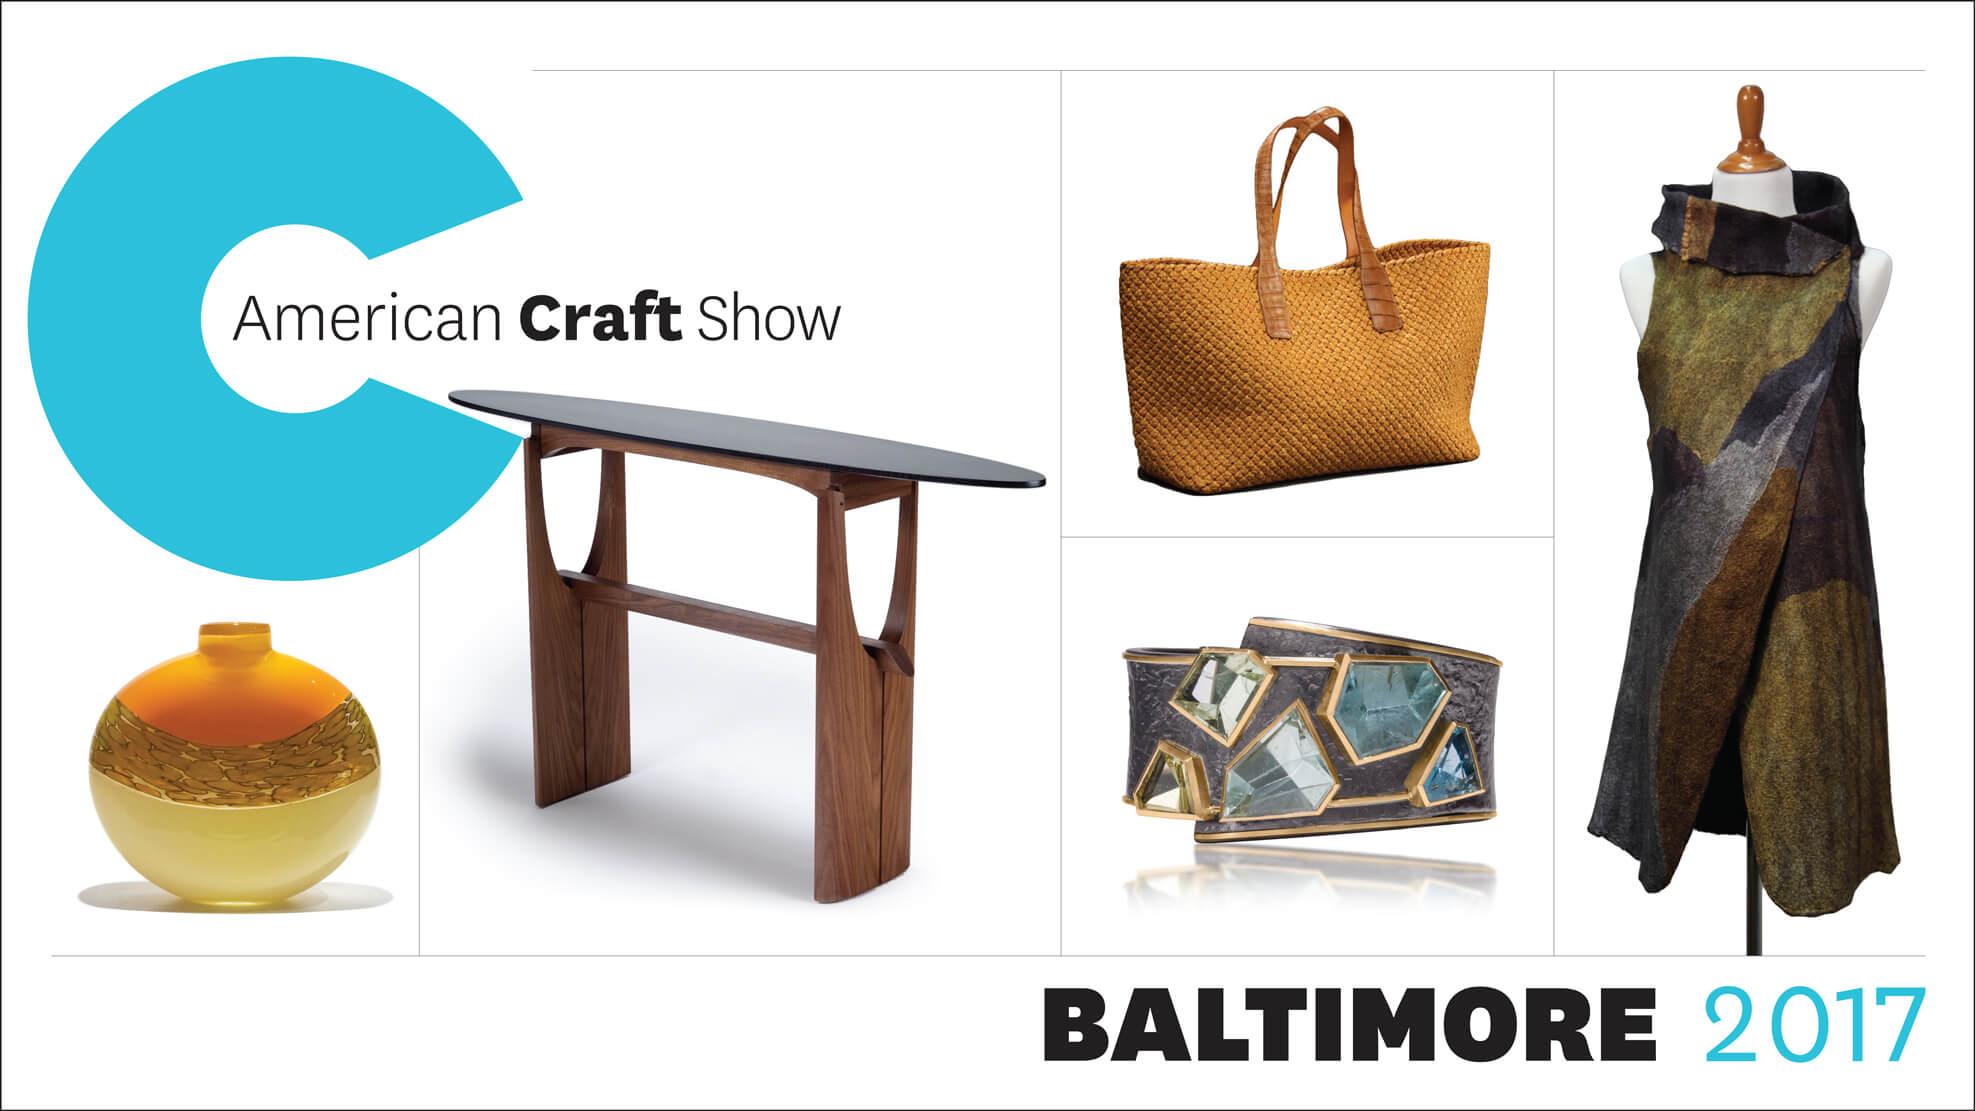 American Craft Show San Francisco